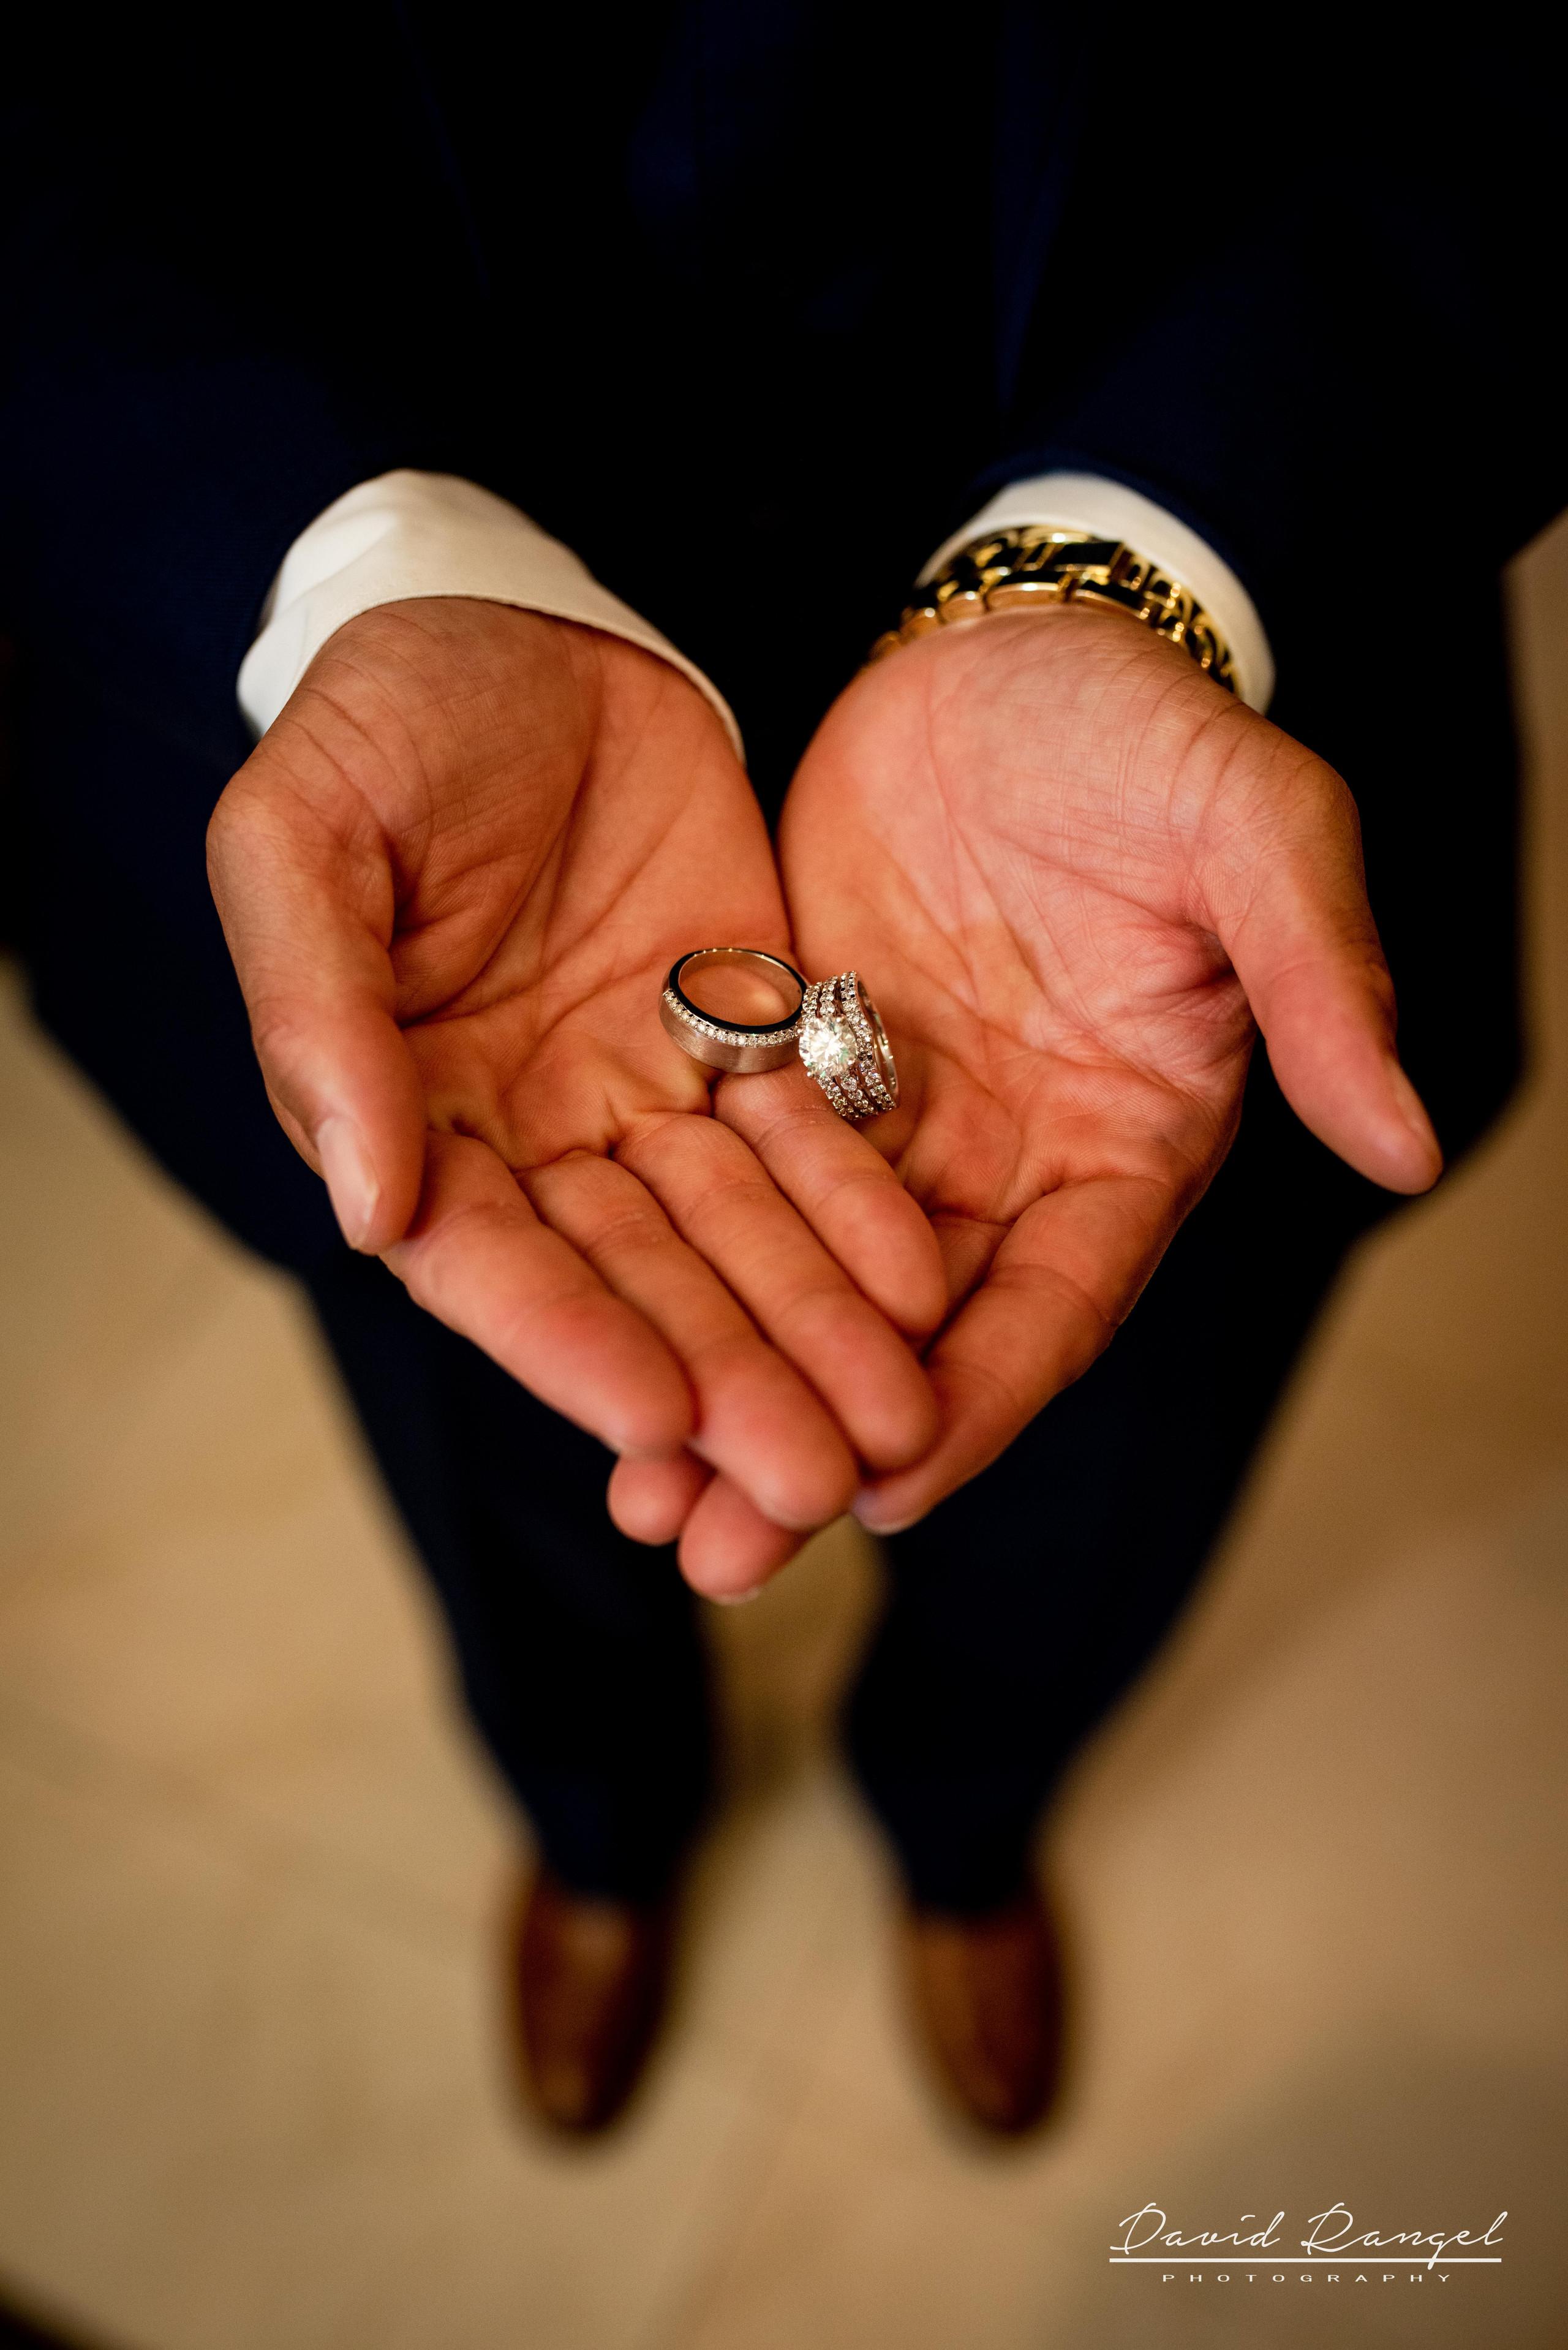 wedding+bands+rings